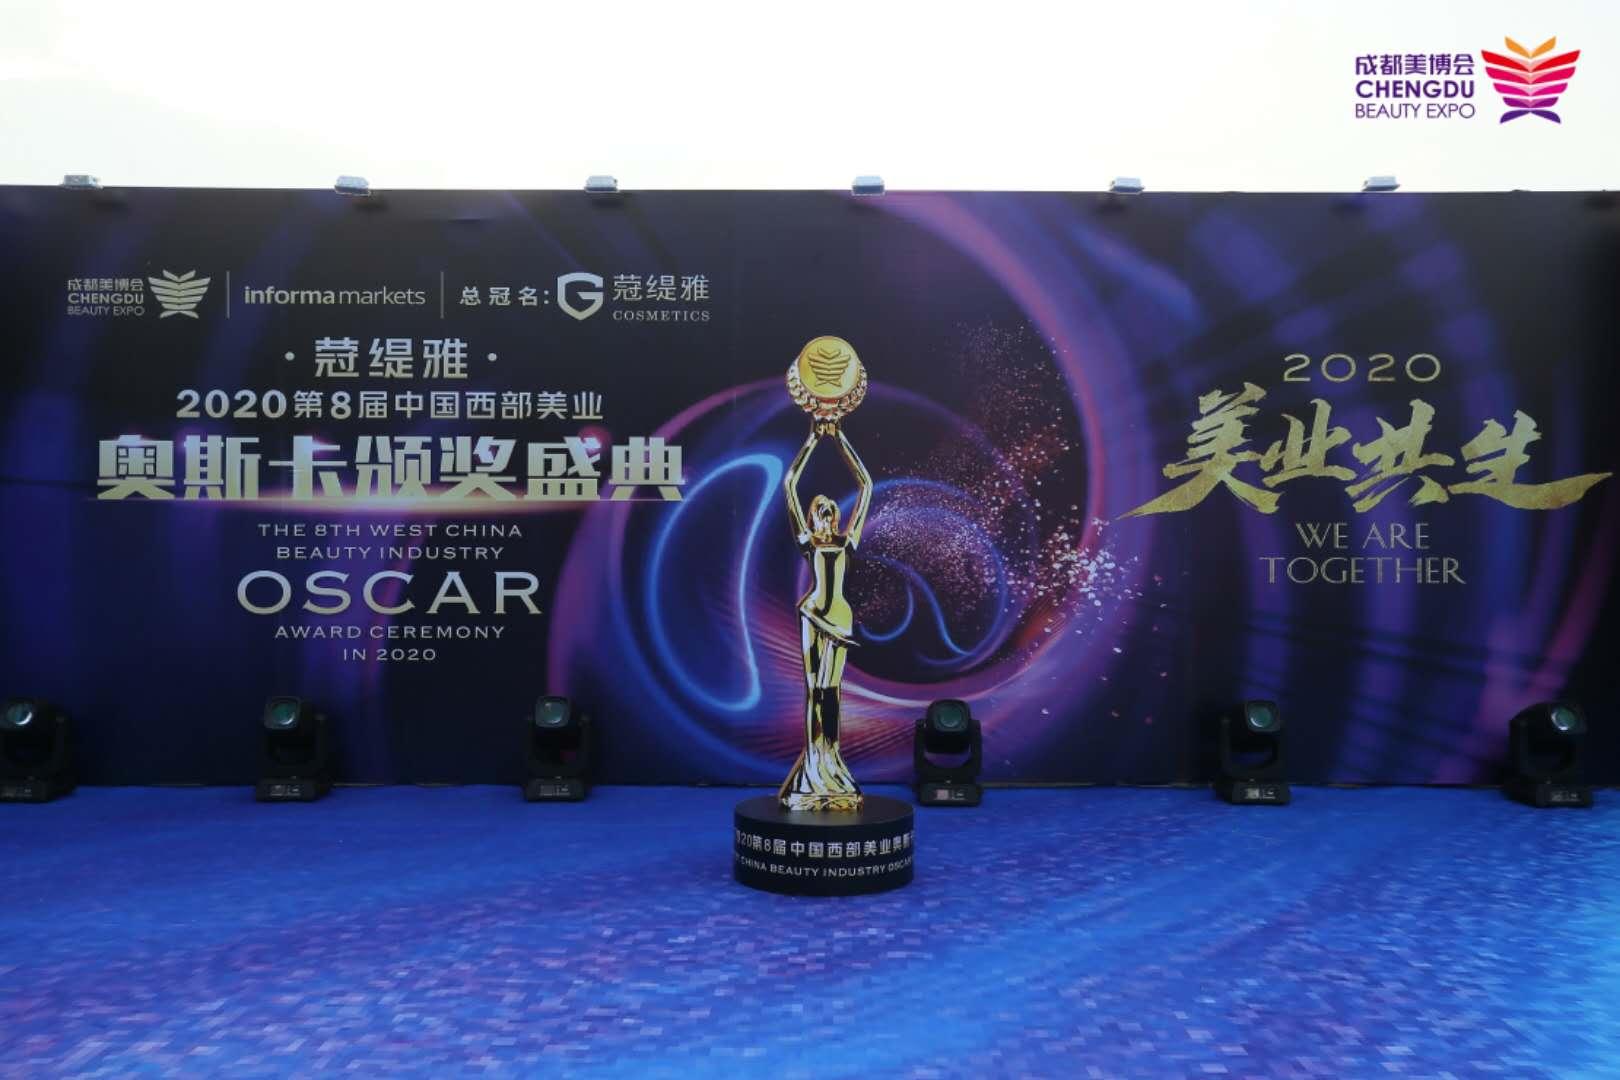 DR MARS火星博士荣获2020西部美业年度新锐品牌大奖